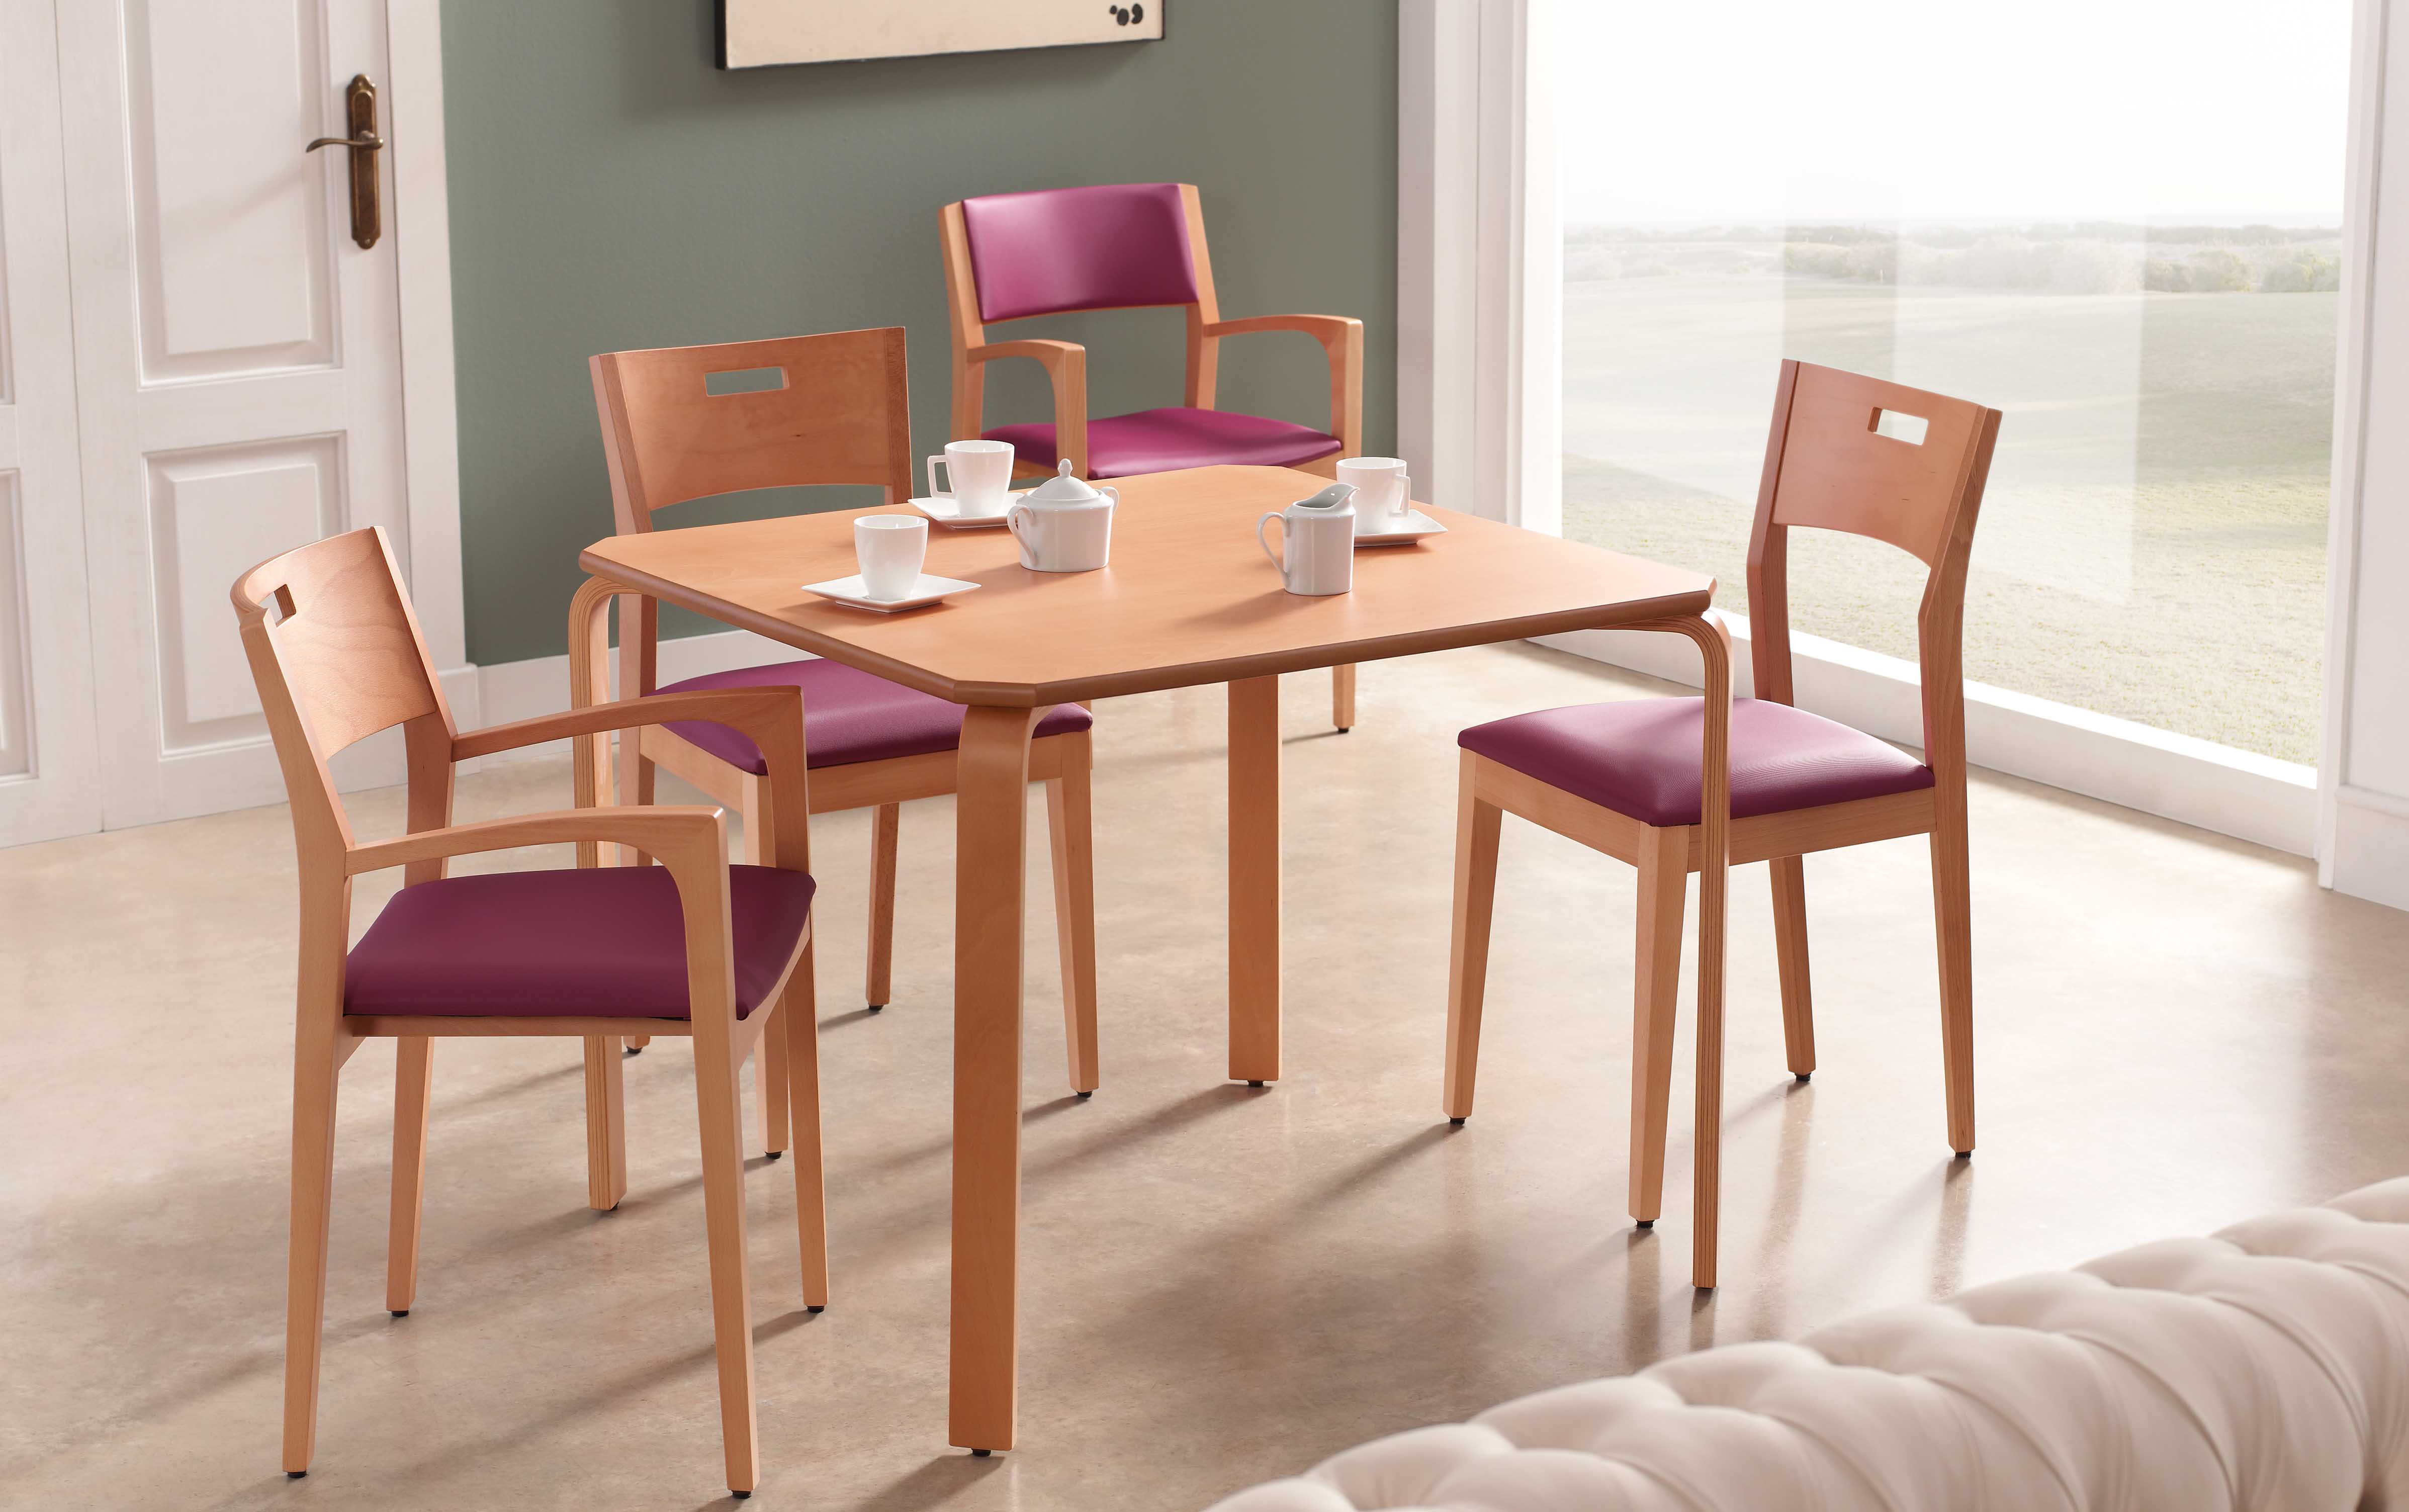 Ambiente comedor mesa modelo Arco